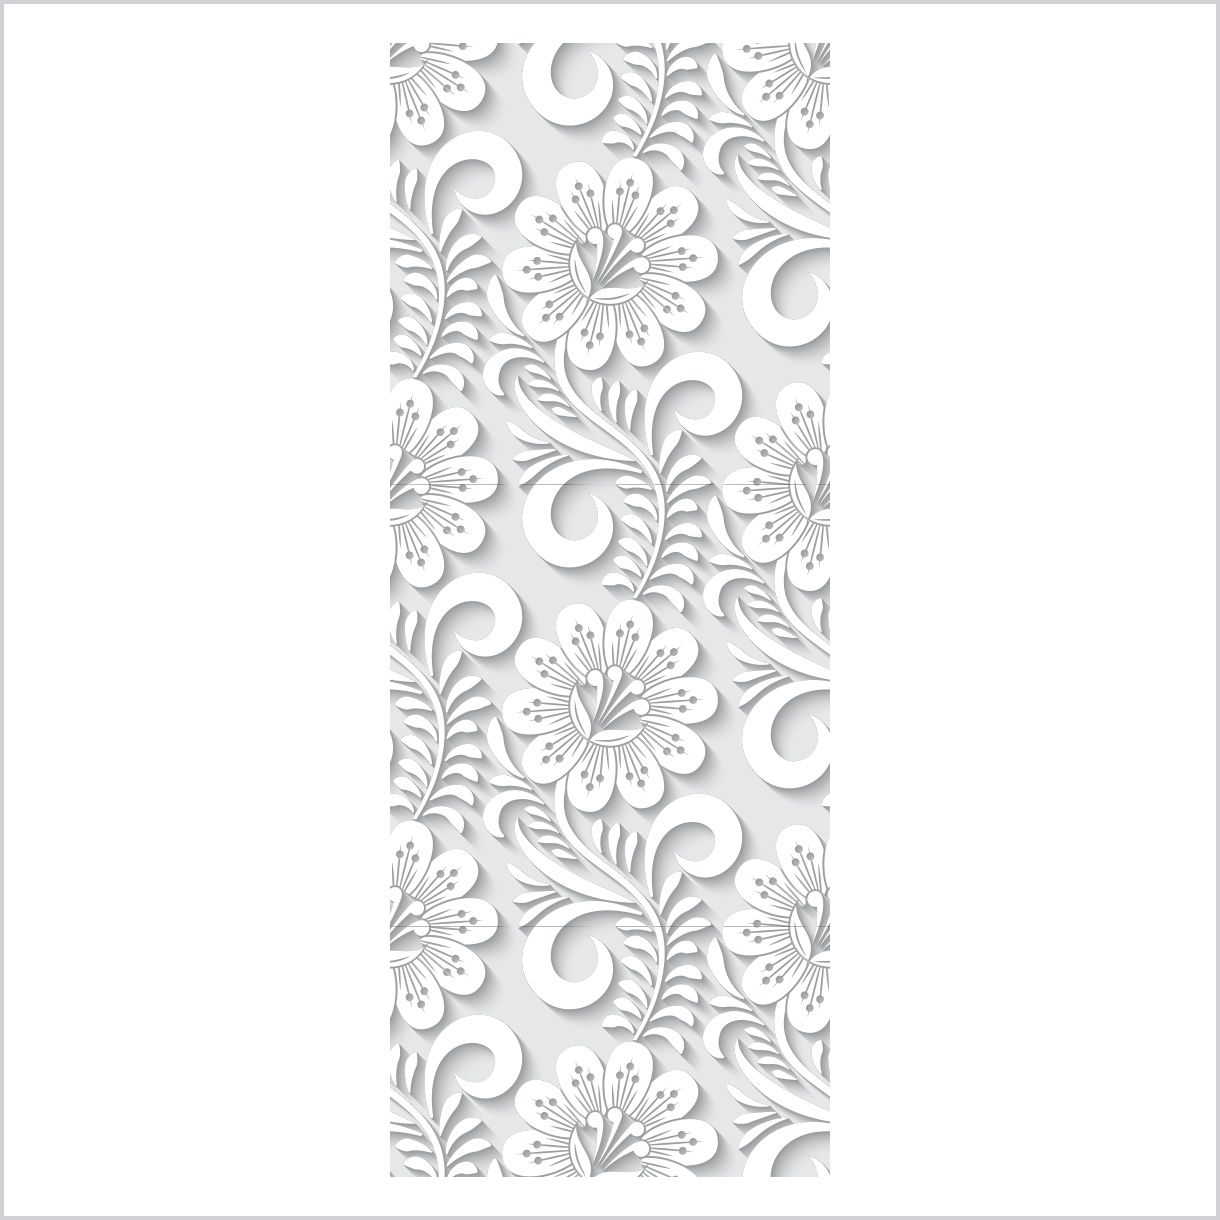 ADESIVO DE PORTA - Floral 3D 4